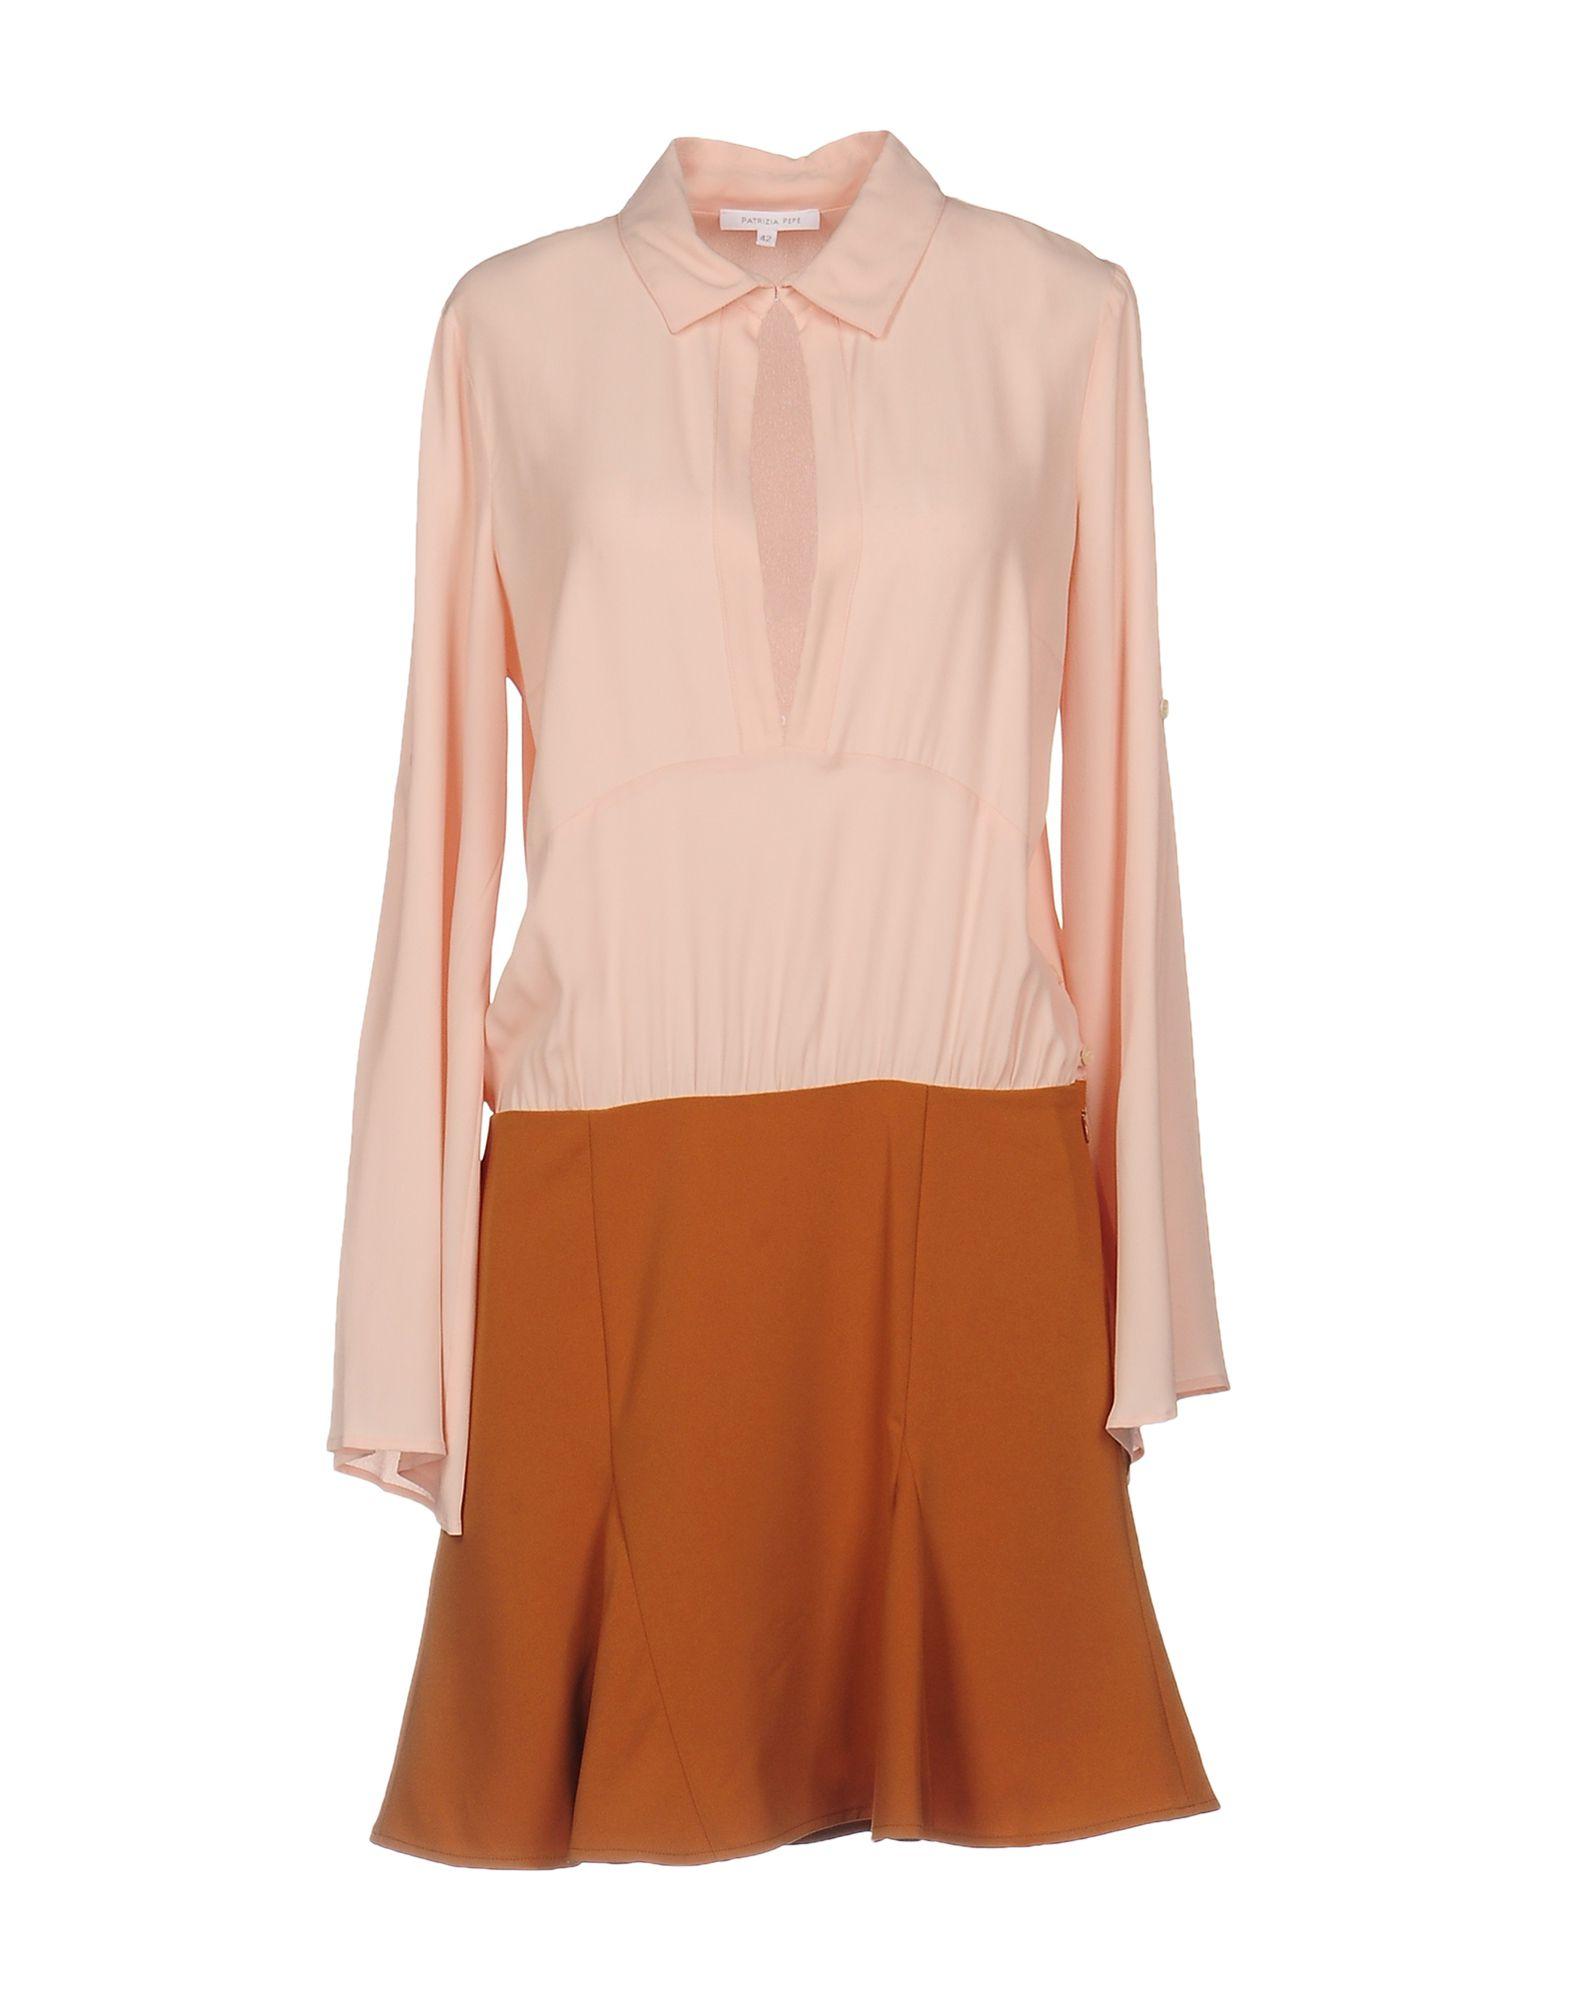 PATRIZIA PEPE Короткое платье платье рубашка fox yulia sway платье рубашка fox